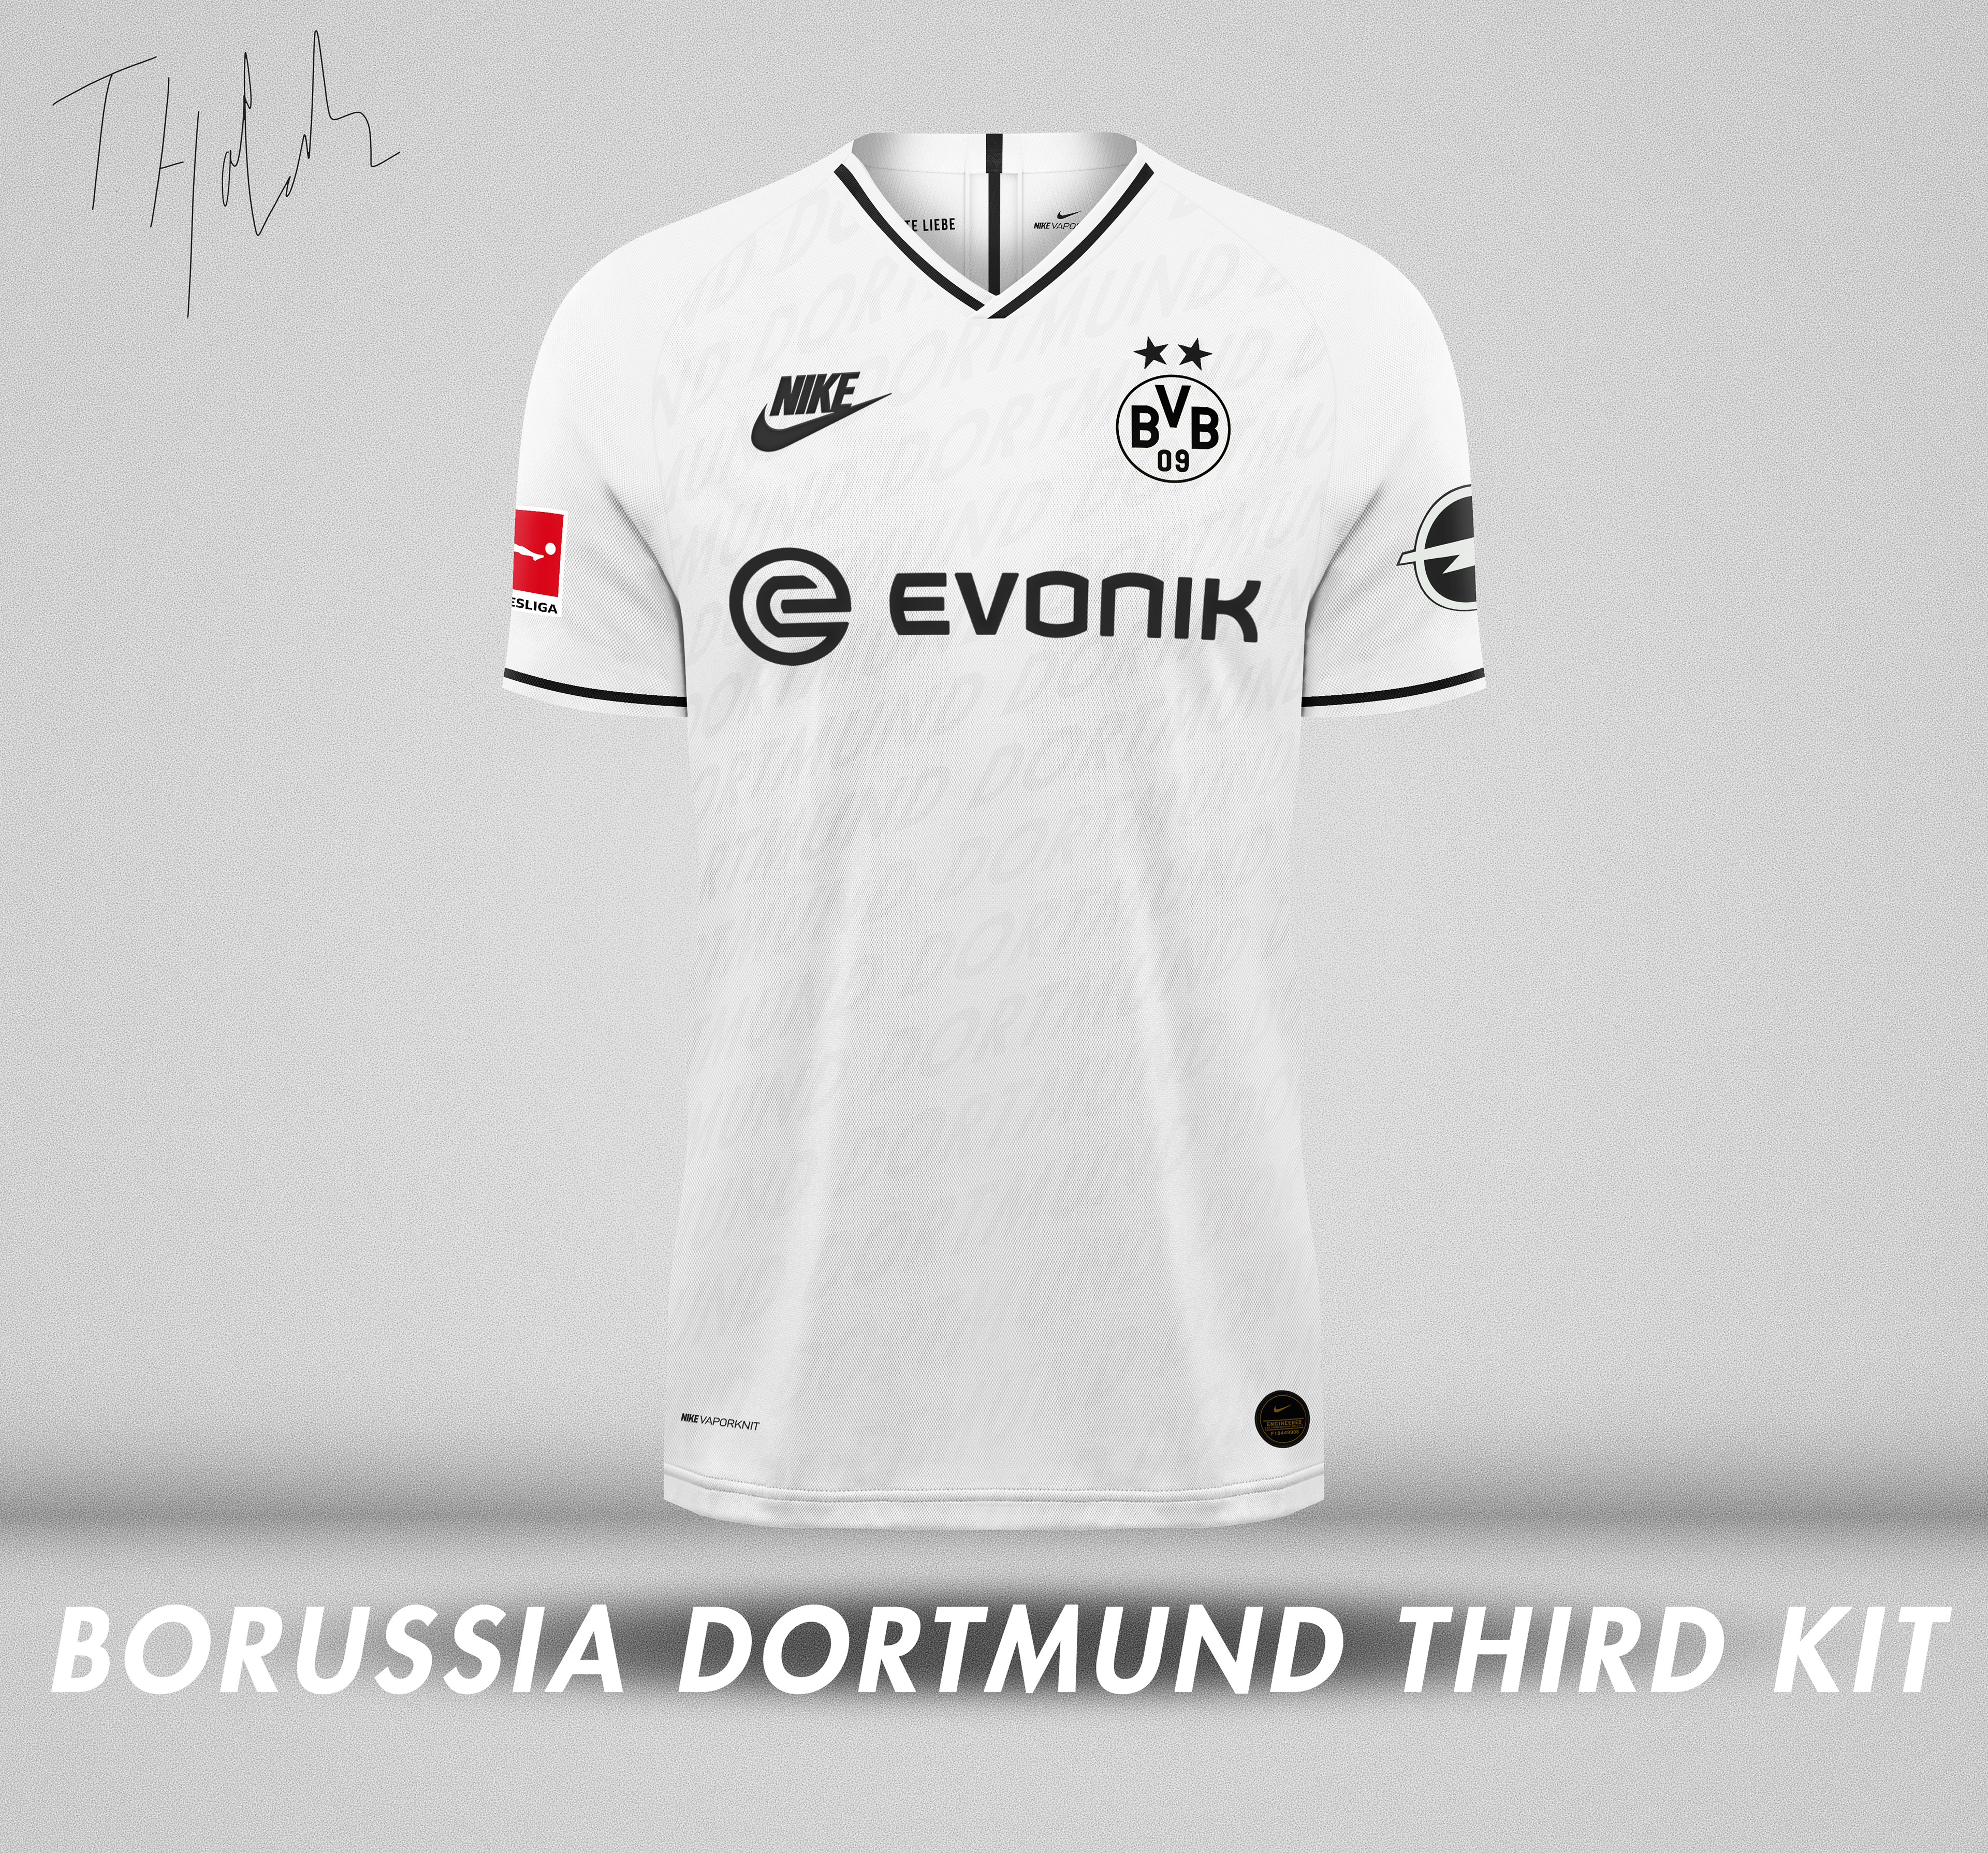 lana Cabina Embajador  Tiarnan Hatchell - Nike x Borussia Dortmund Kit Concept